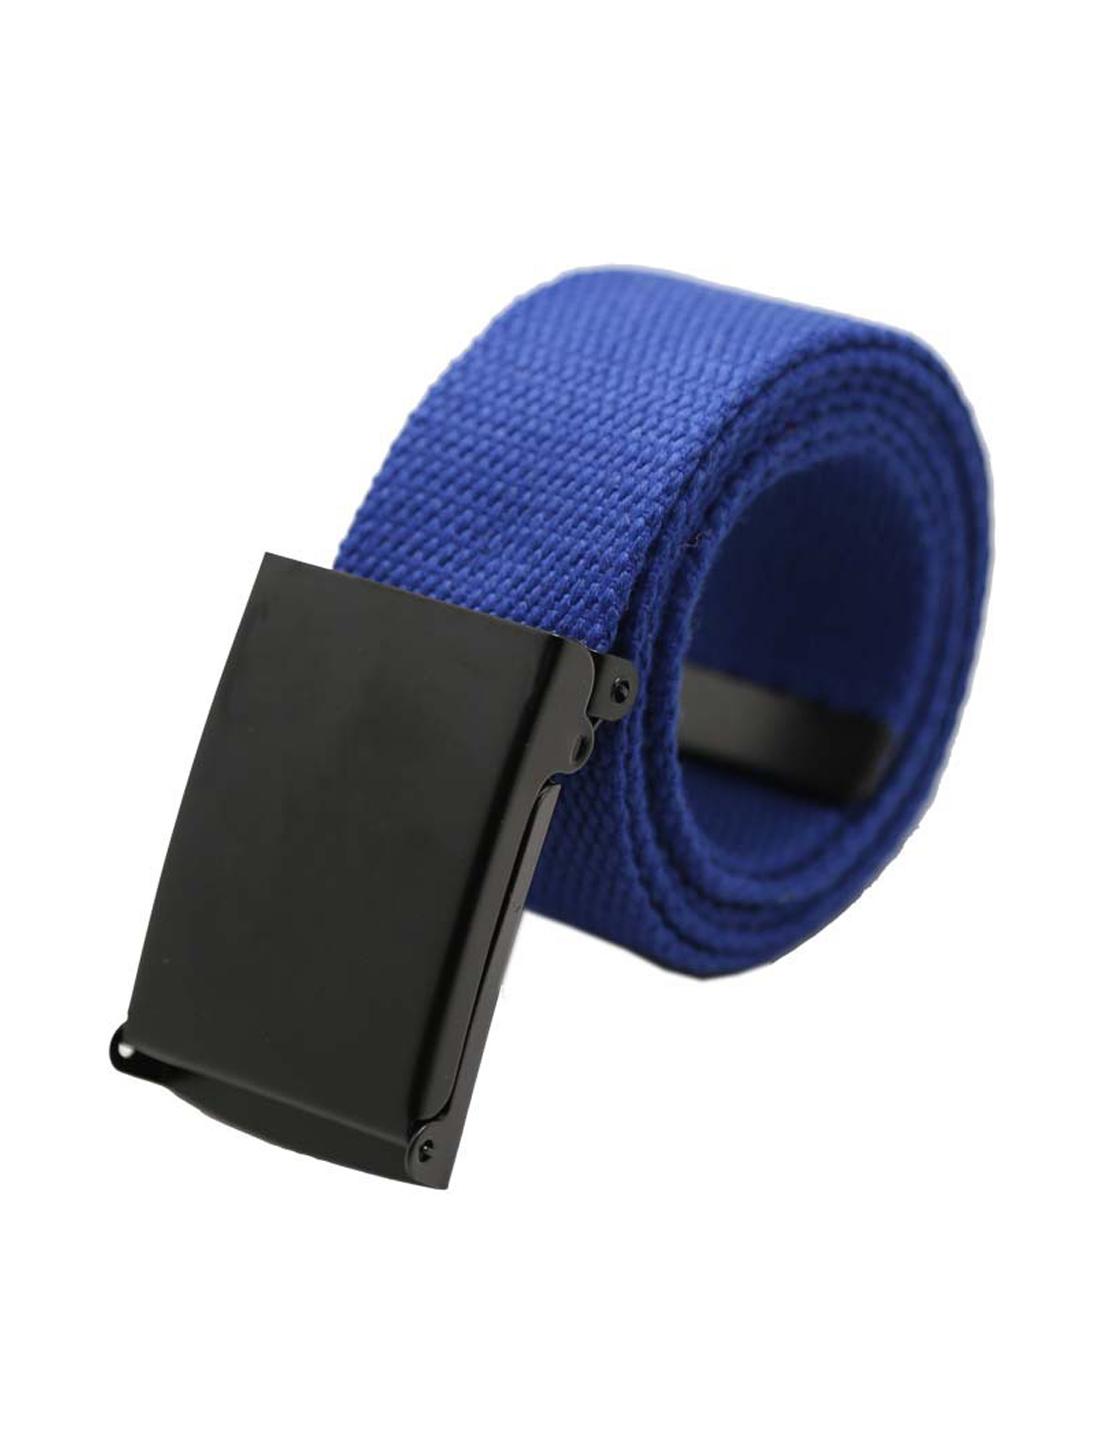 "Unisex Canvas No Holes Slide Buckle Adjustable Waist Belt Width 1 5/8"" Royal"